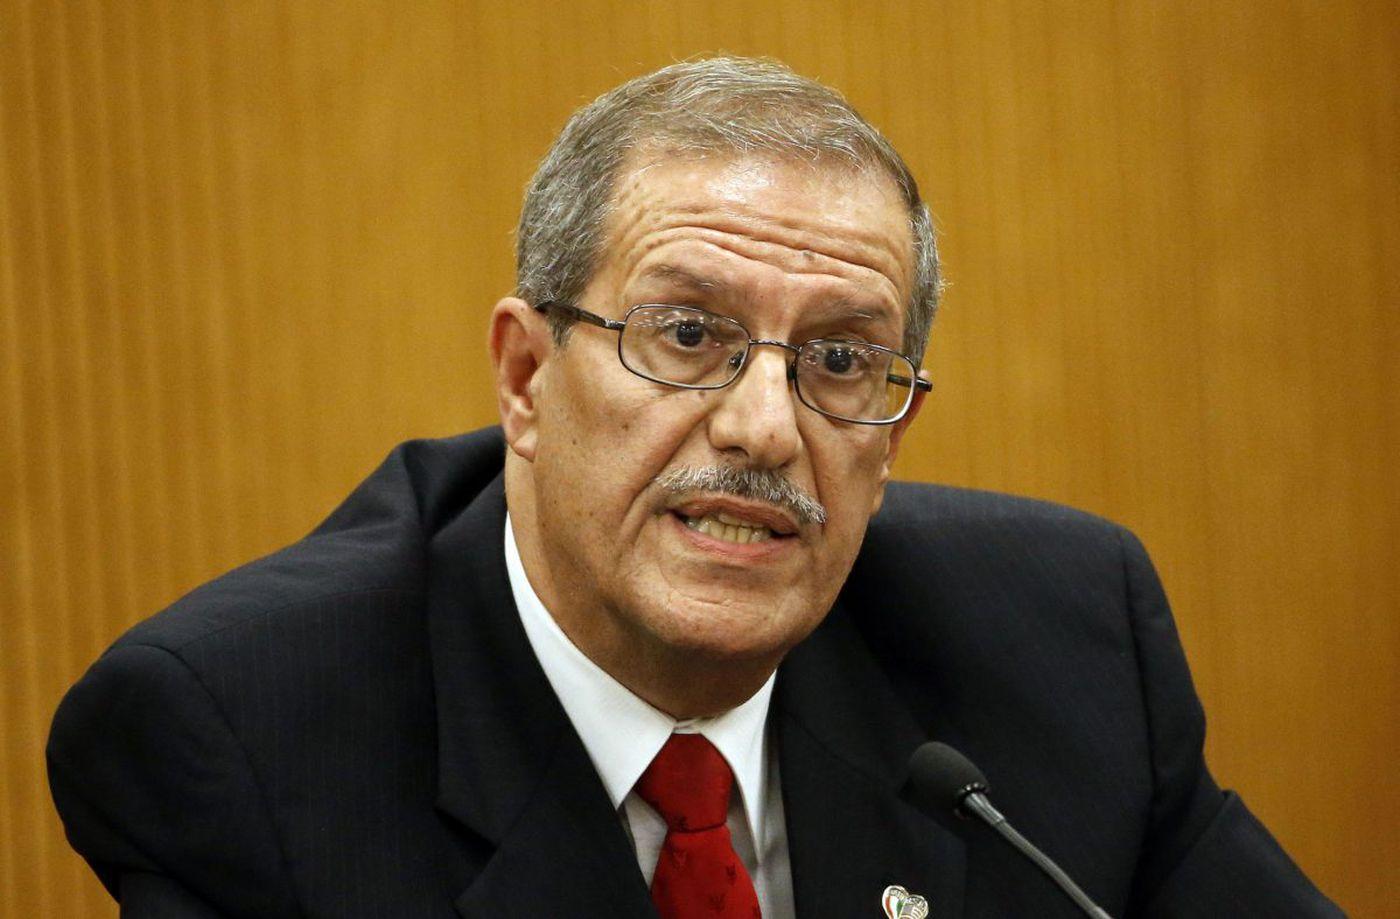 Retired Philly judges seeks interim DA job